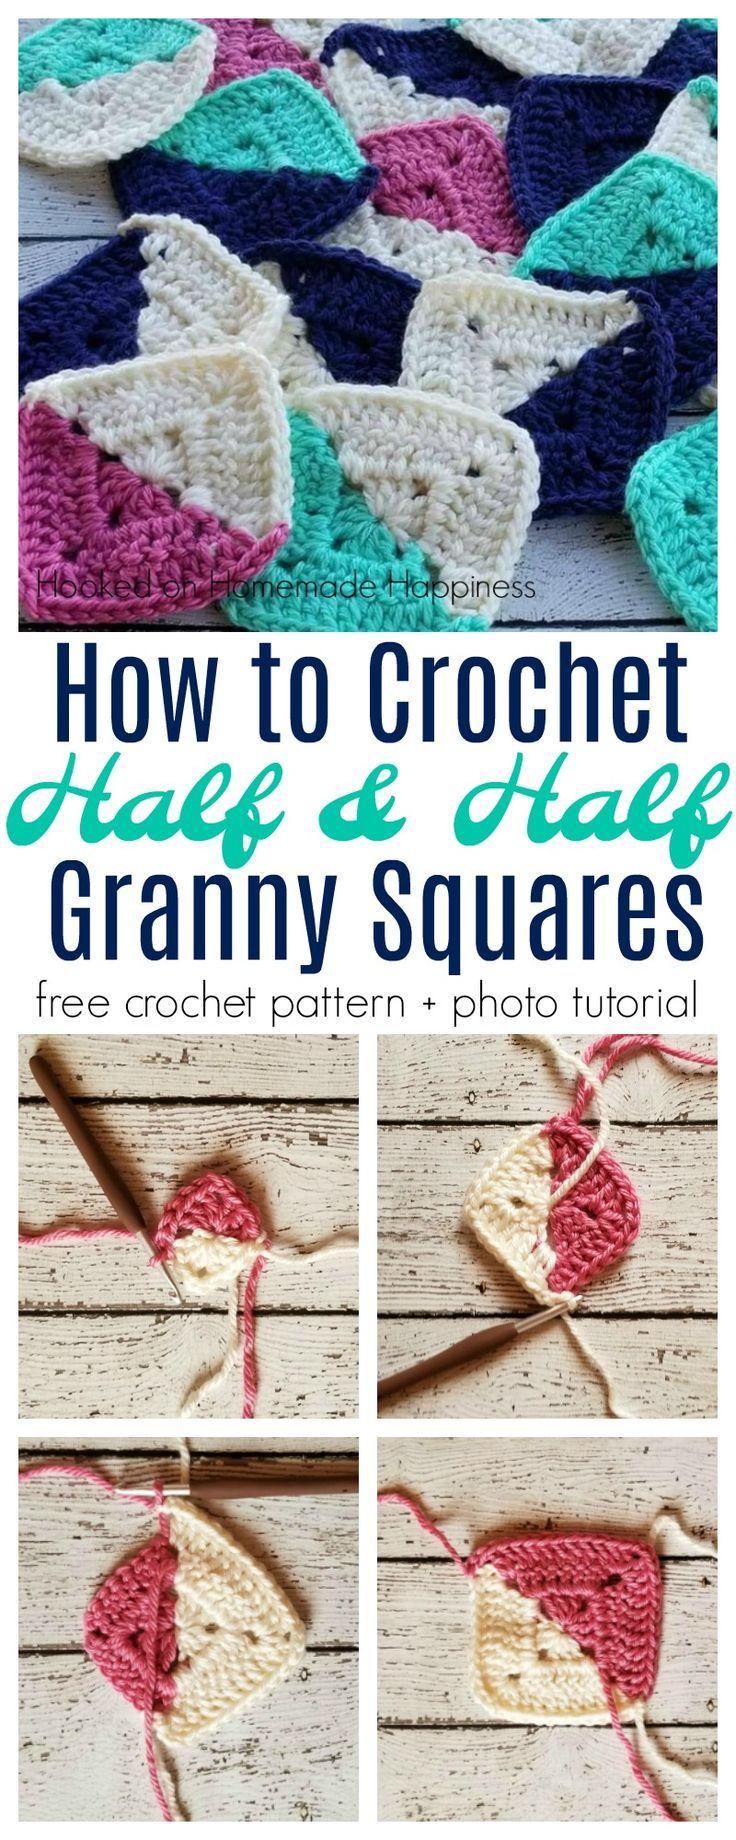 Half and Half Granny Square Crochet Pattern | Crochet ideas ...